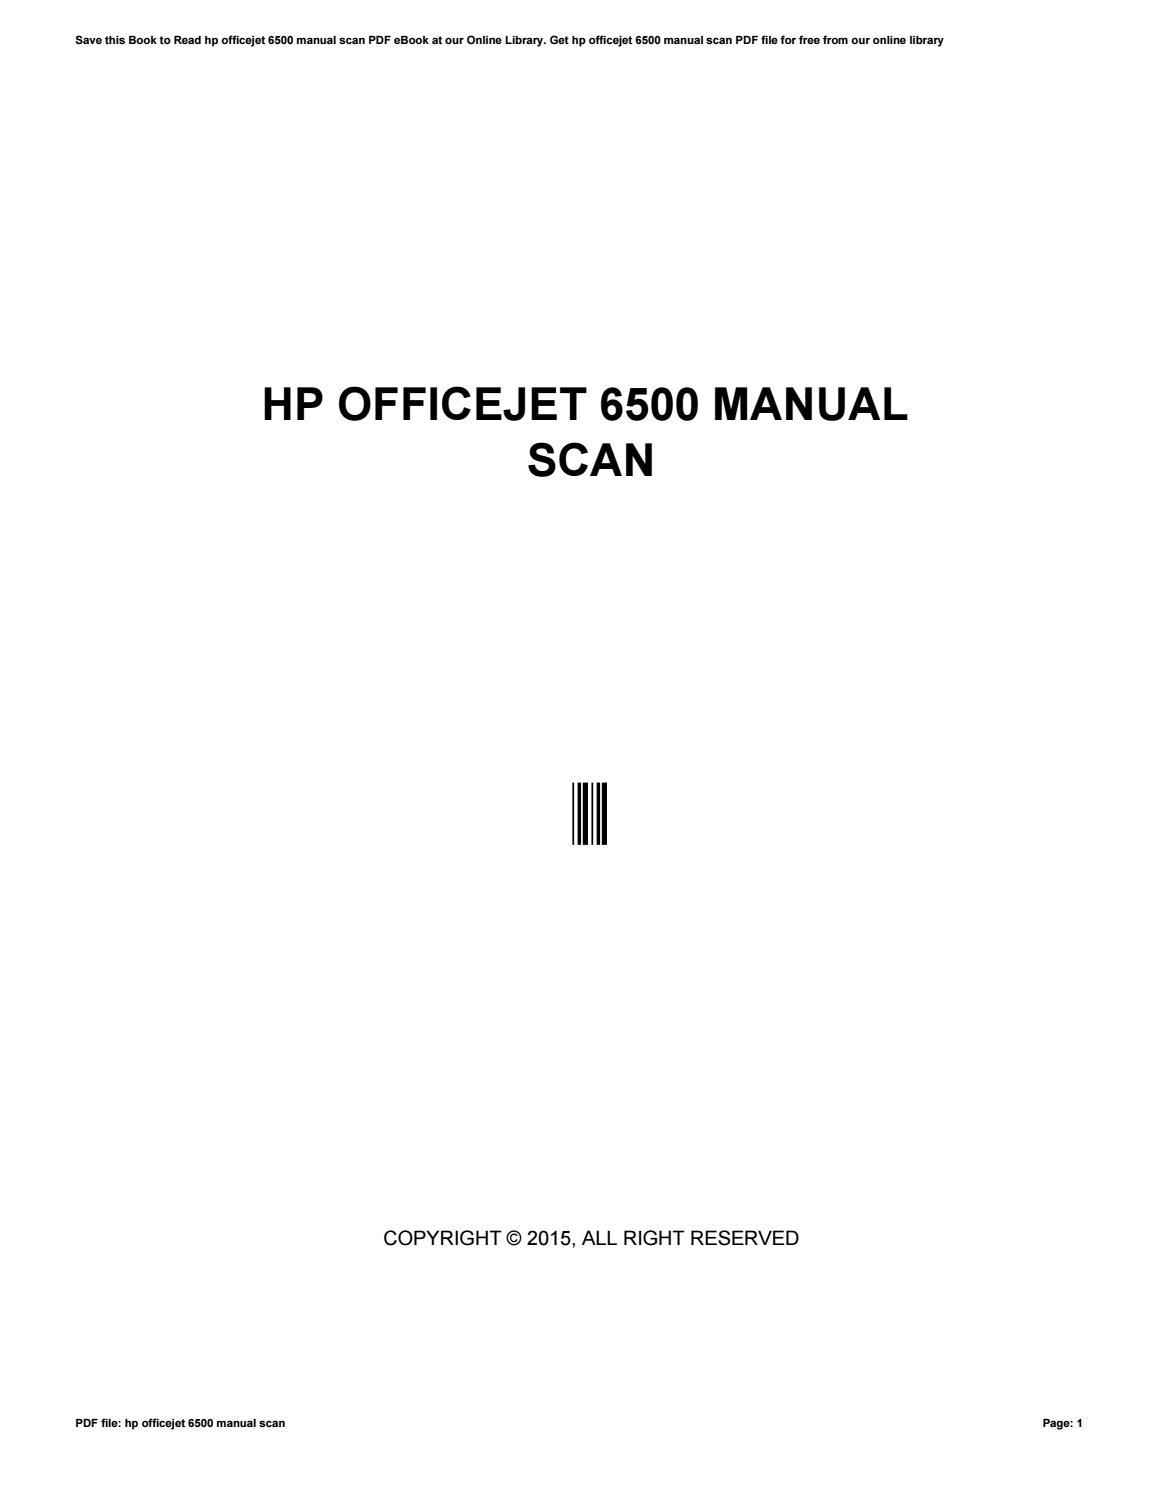 hp officejet 6500 manual scan by j5310 issuu rh issuu com HP Officejet 6500 Wireless HP Officejet 6500 Wireless